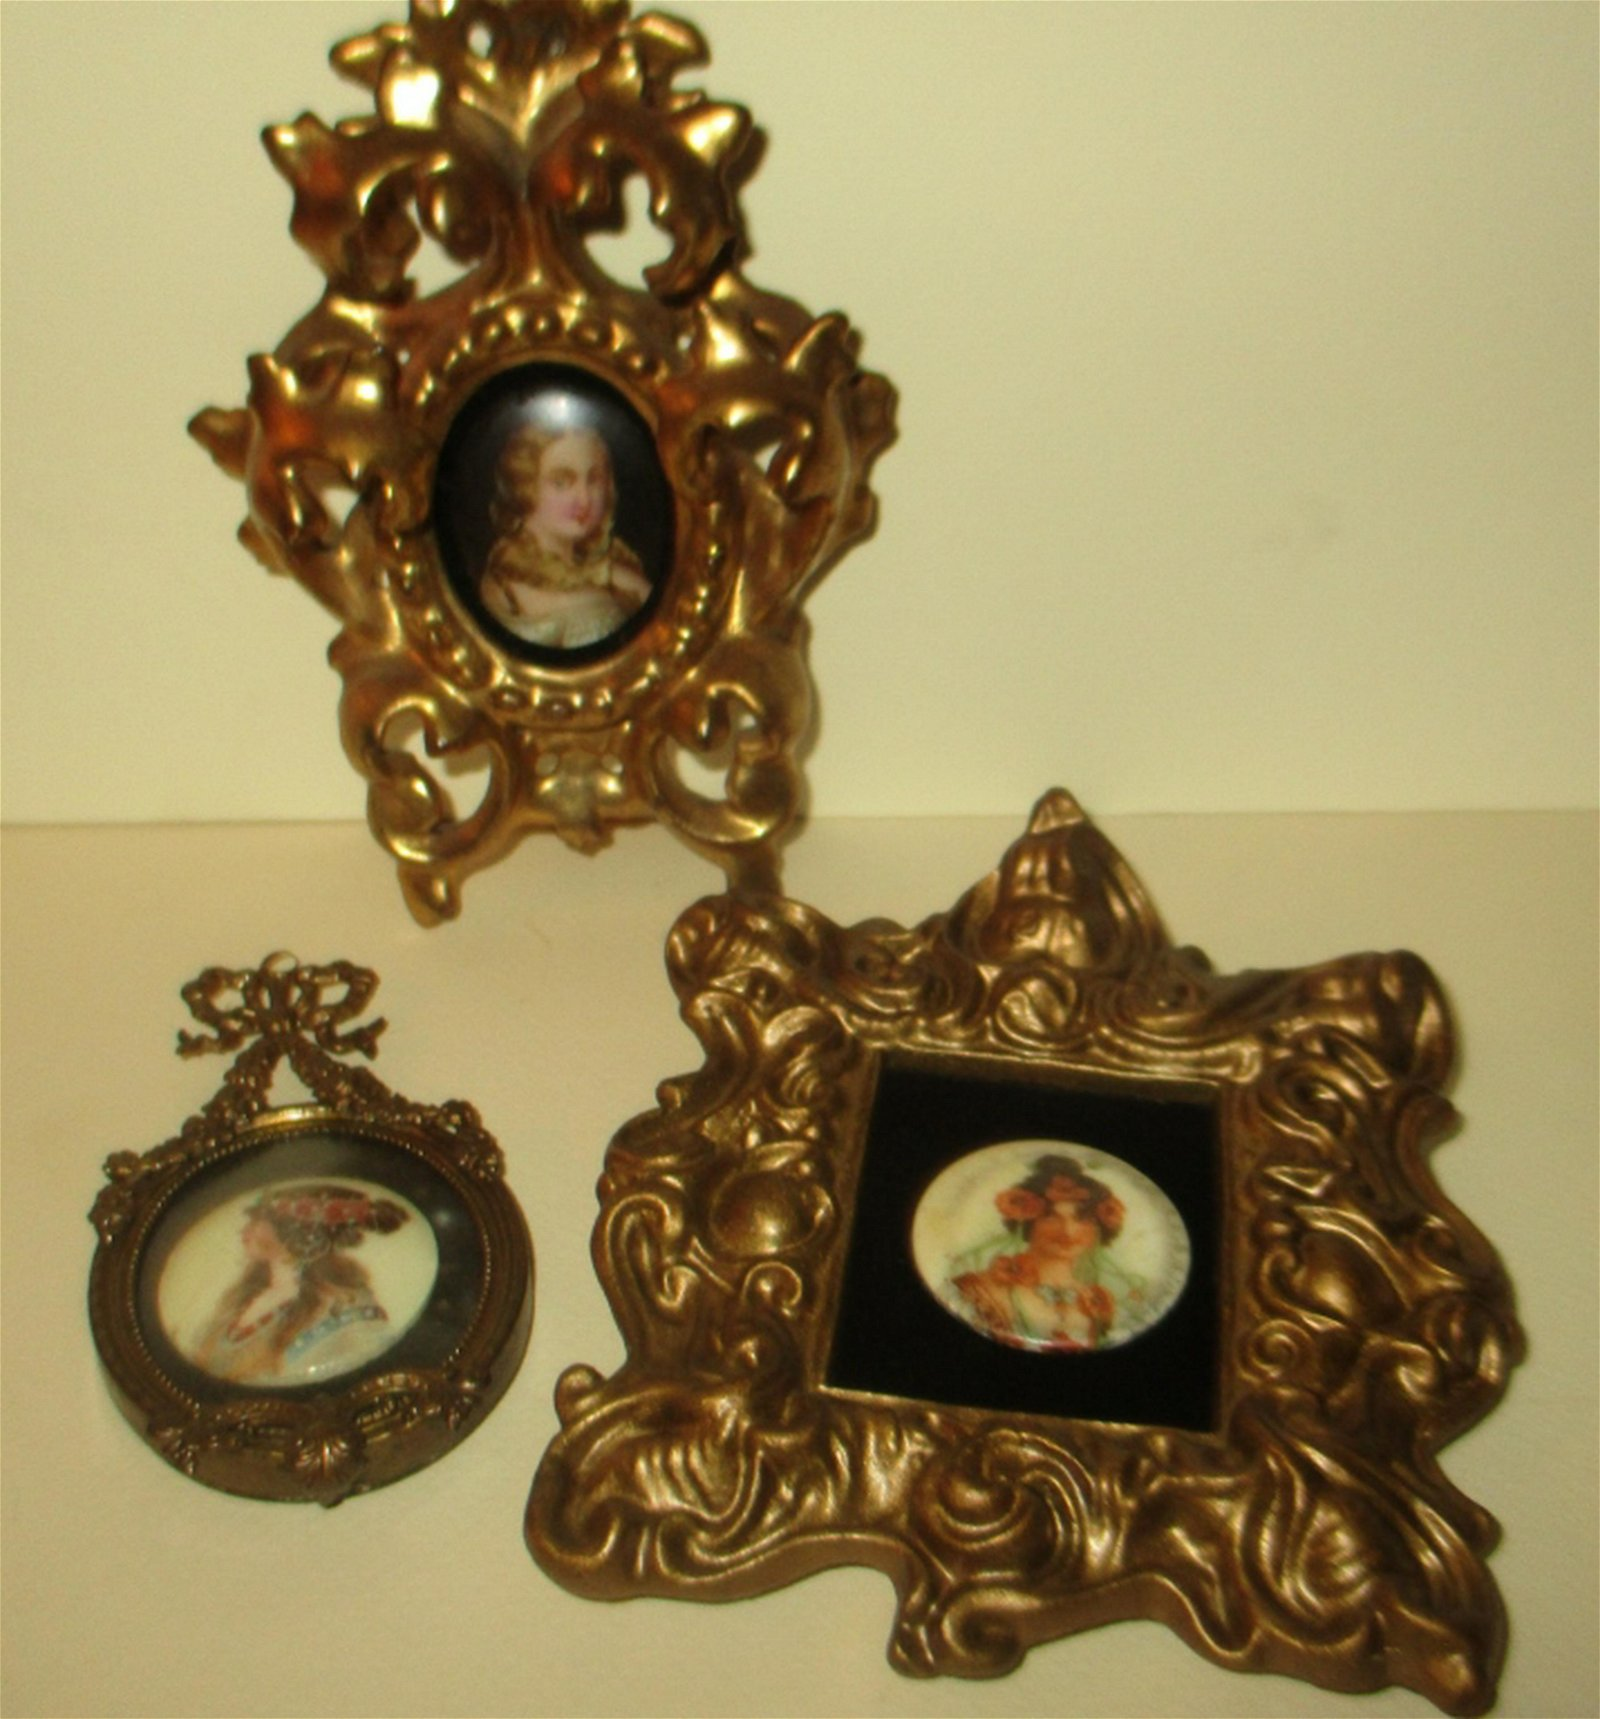 Three Framed Miniature Porcelain Plaques